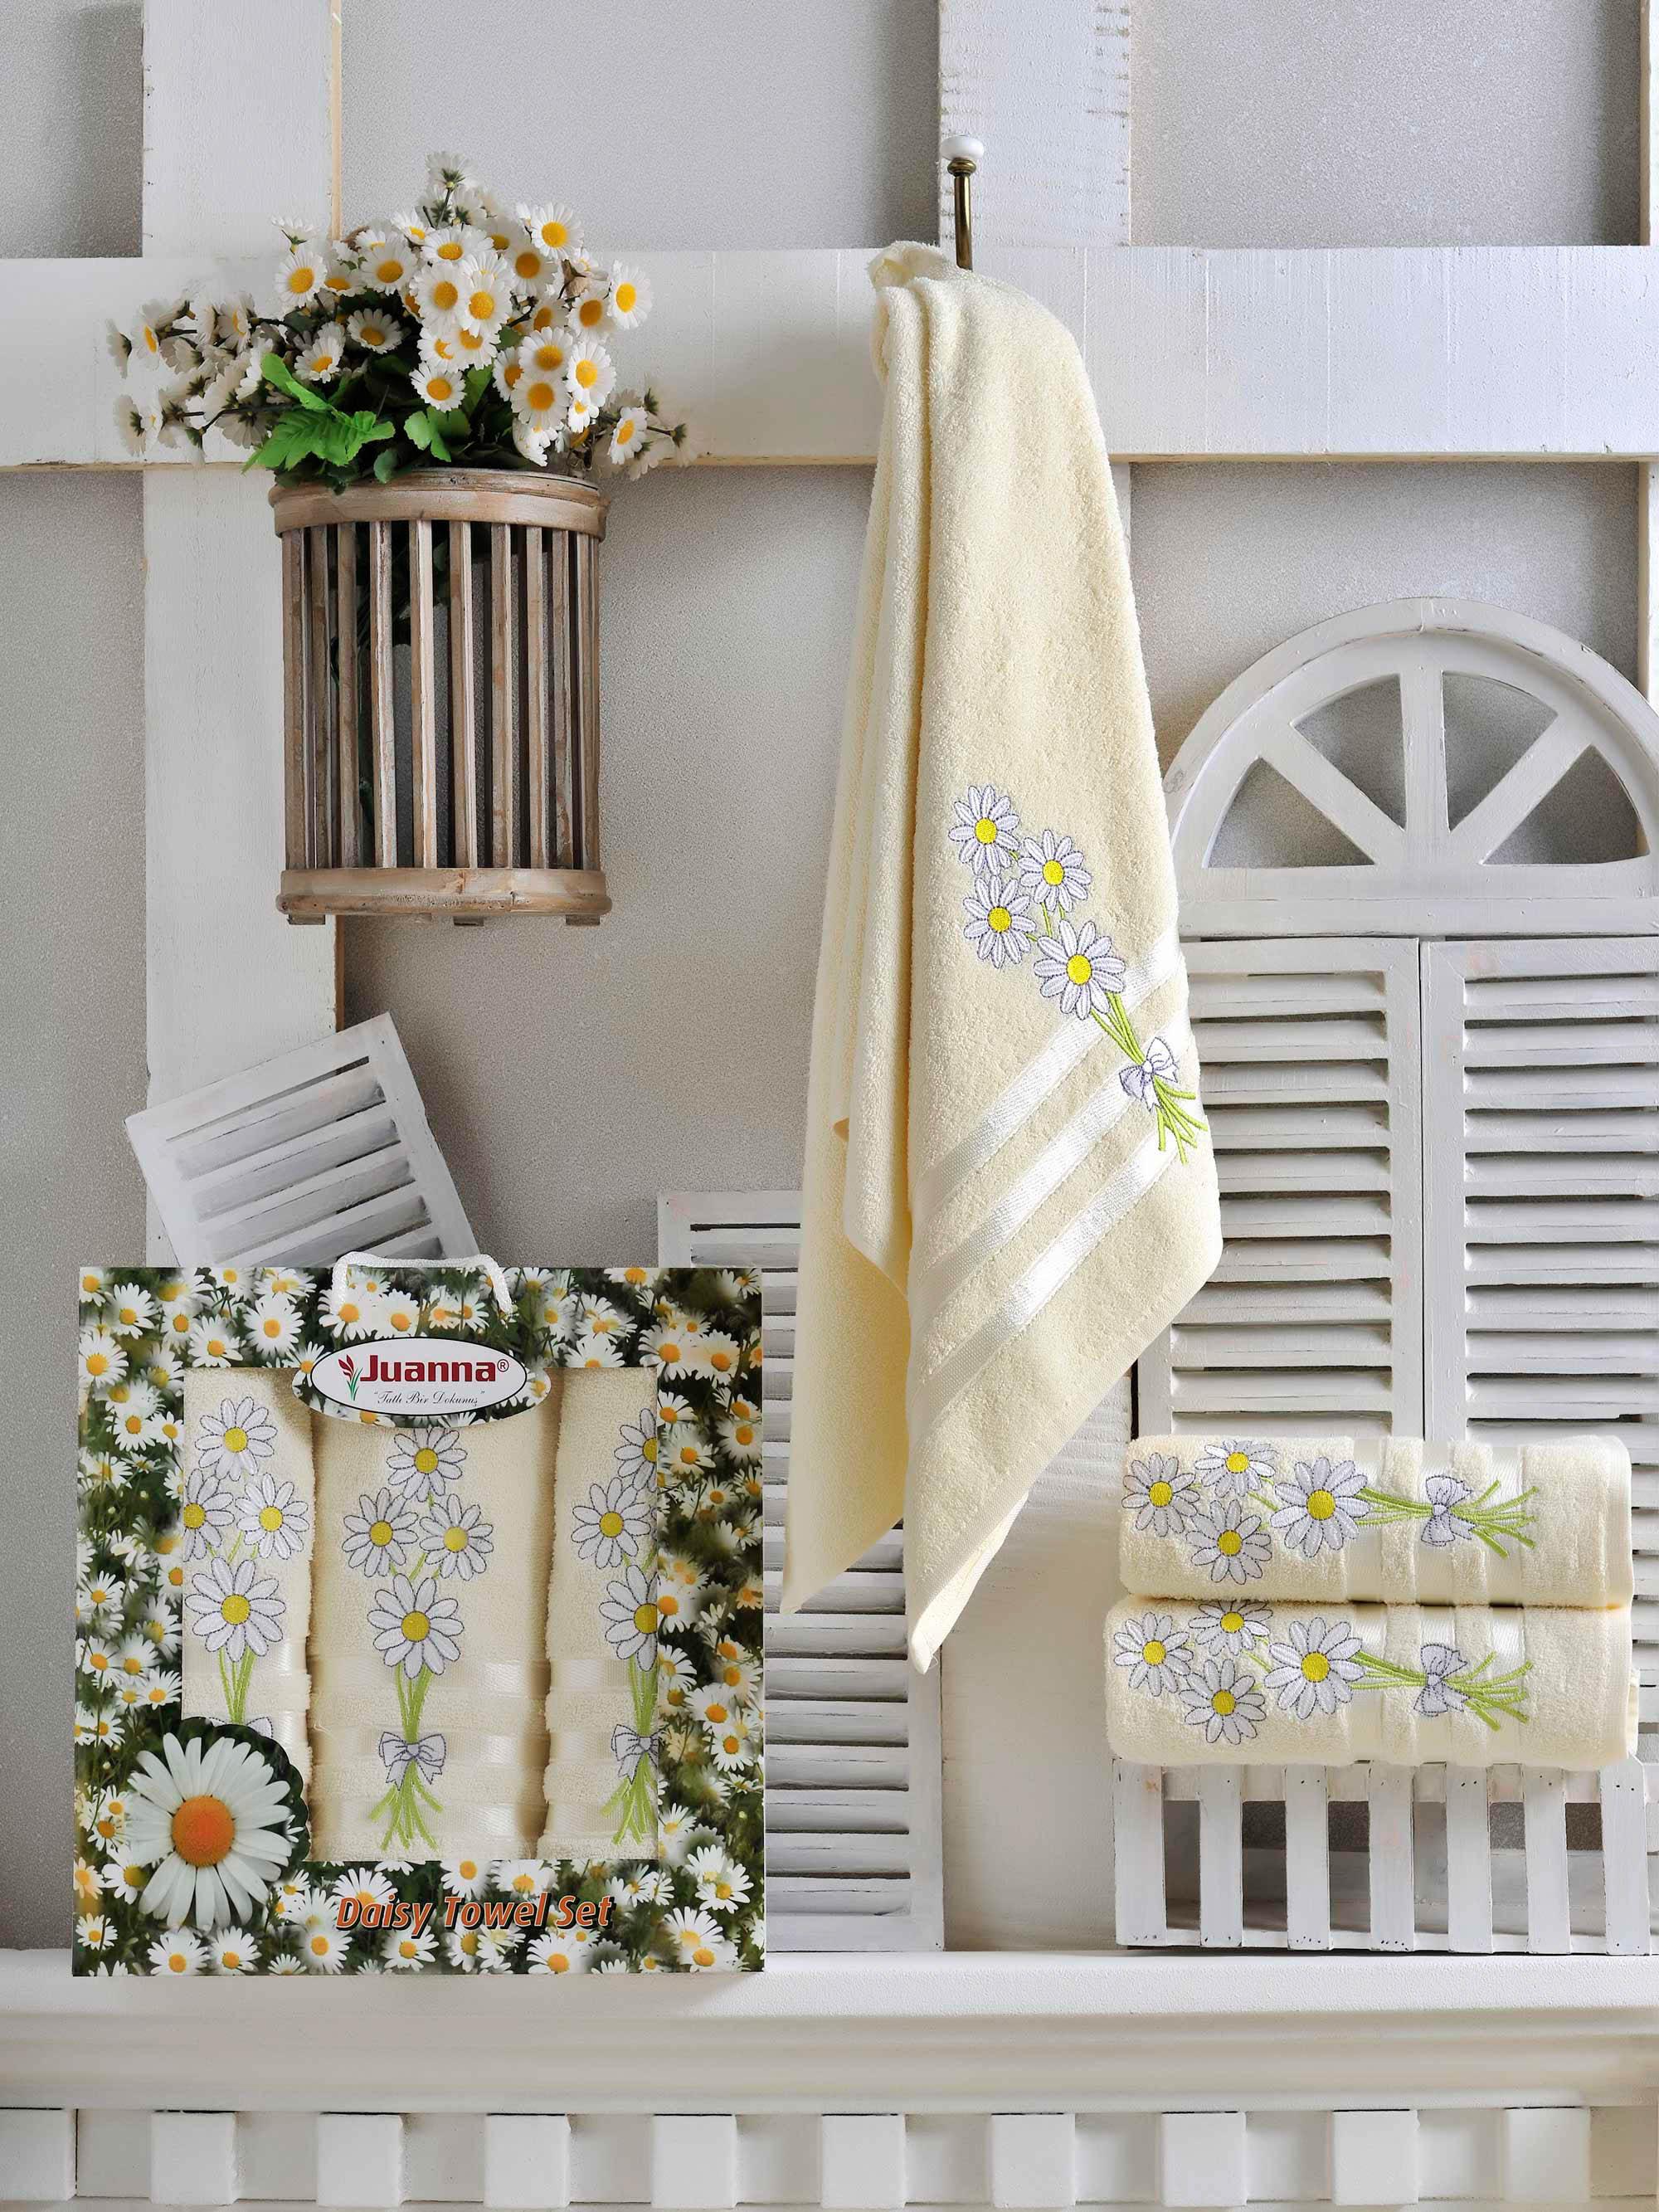 Полотенца Juanna Набор из 3 полотенец Papatya Цвет: Кремовый полотенца pupilla набор из 2 полотенец stil цвет кремовый